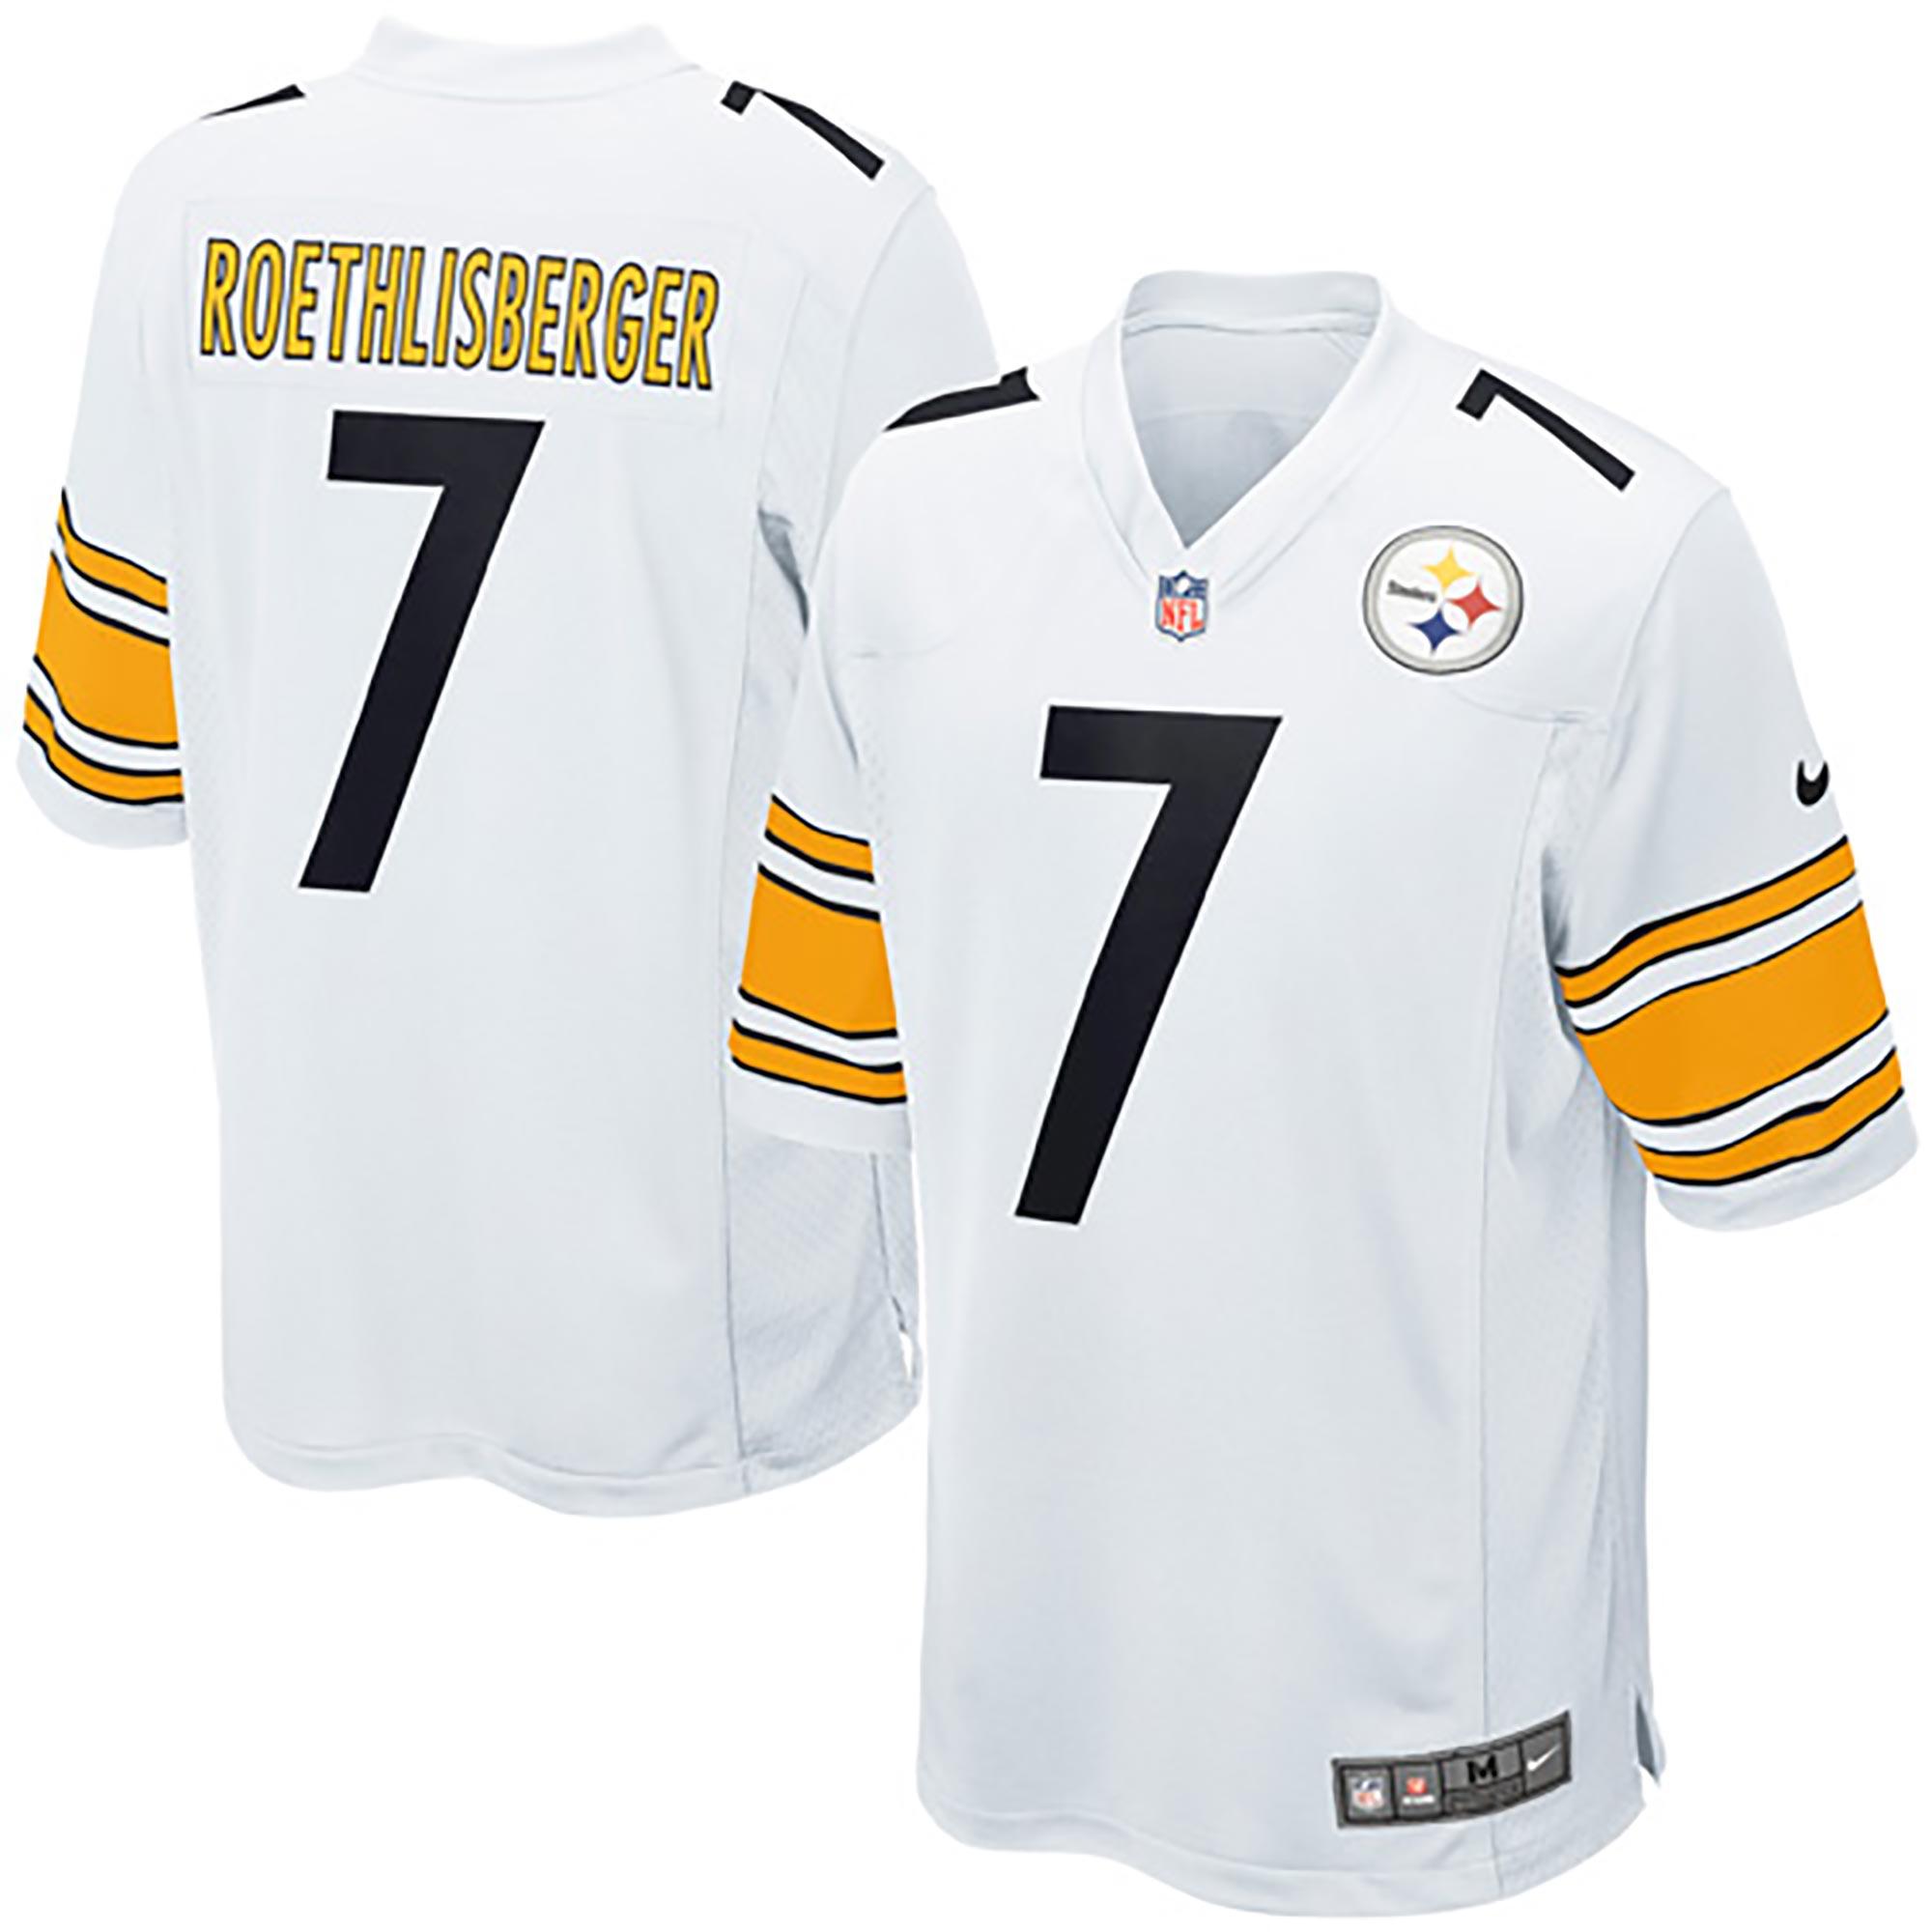 Pittsburgh Steelers Auswärtstrikot – Ben Roethlisberger – Herren